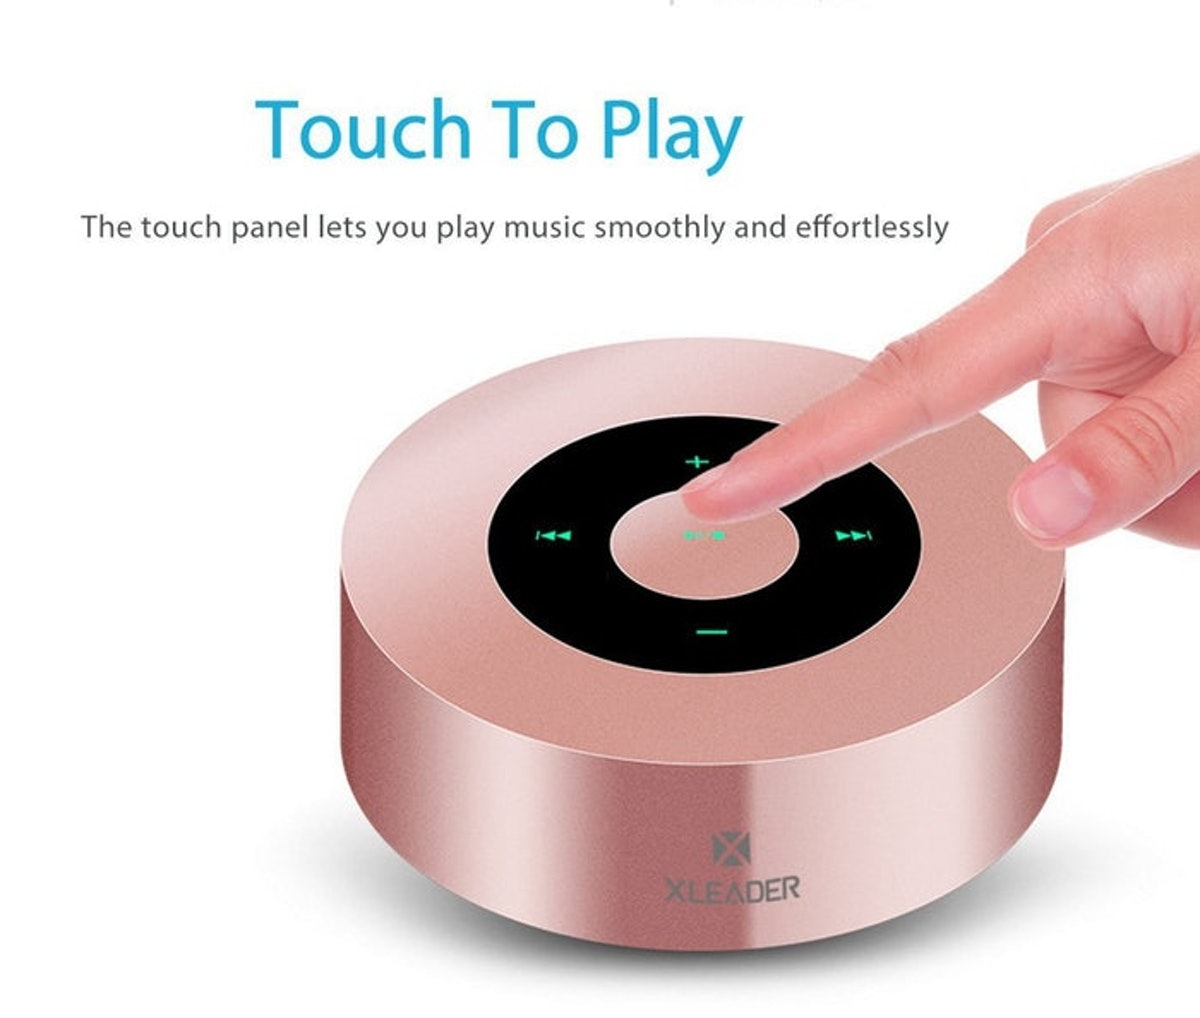 XLEADER Portable Bluetooth Speaker